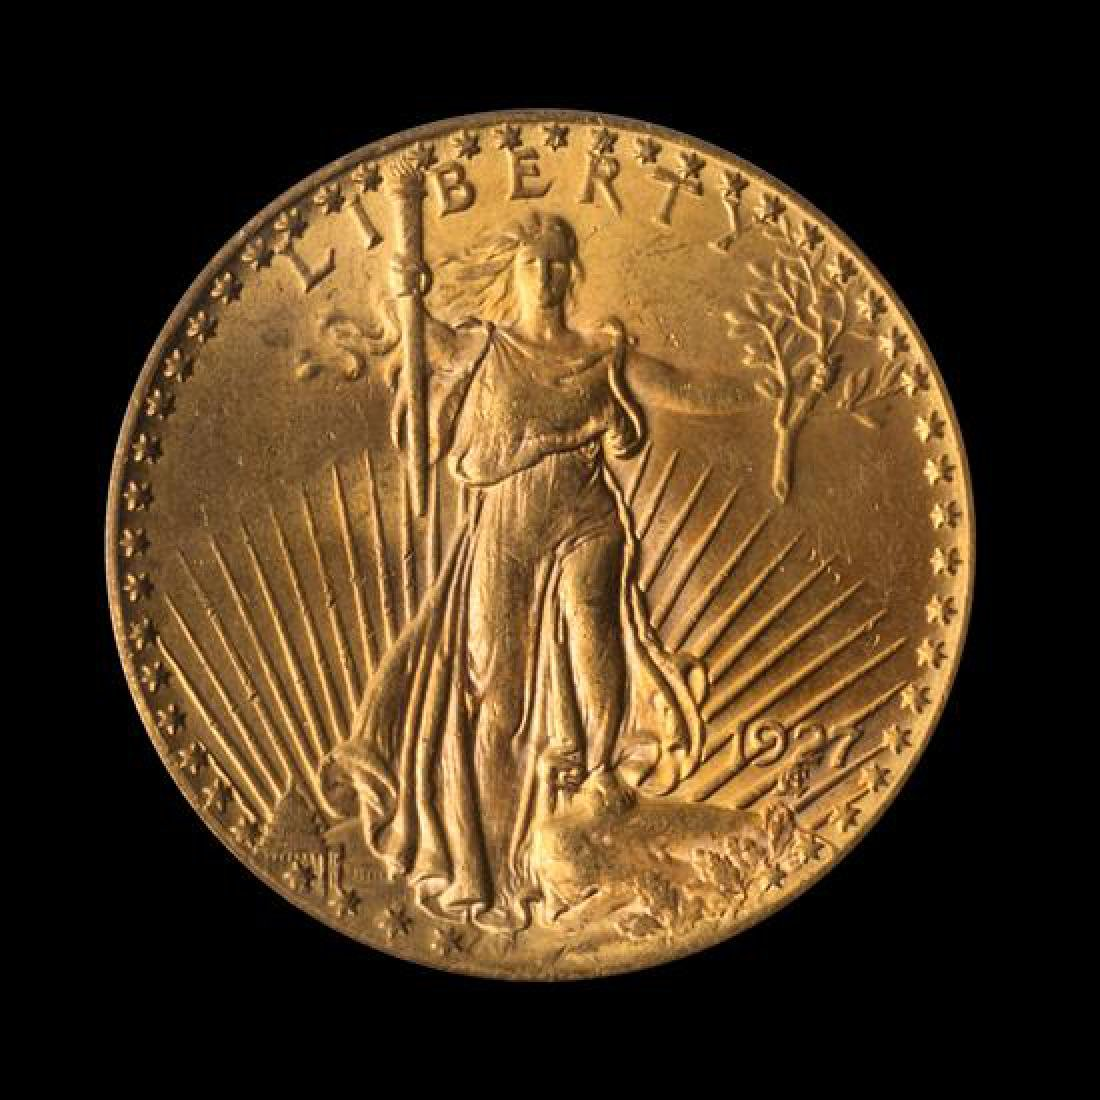 A United States 1927 Saint-Gaudens $20 Gold Coin